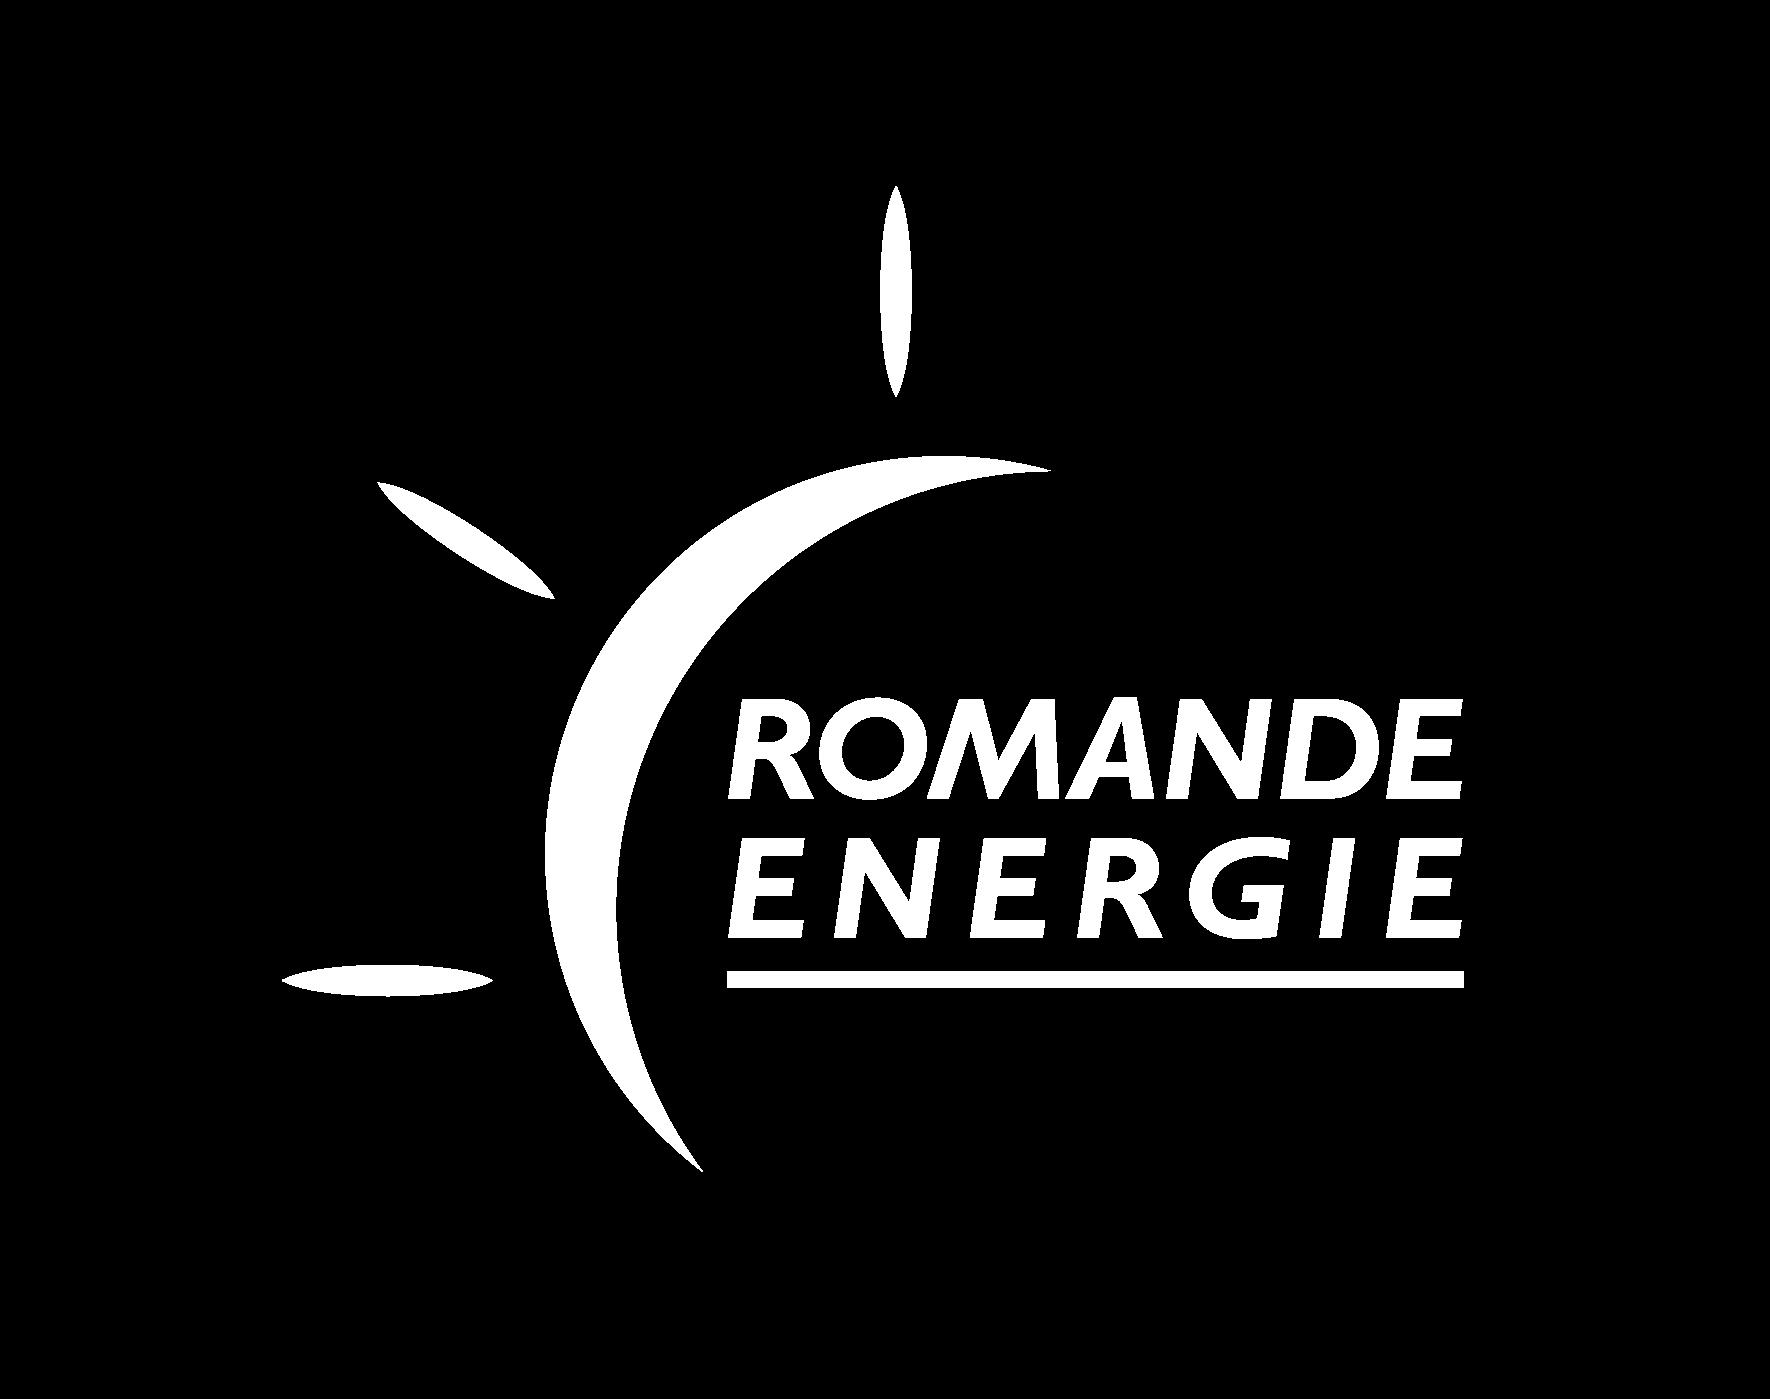 Romande Energie